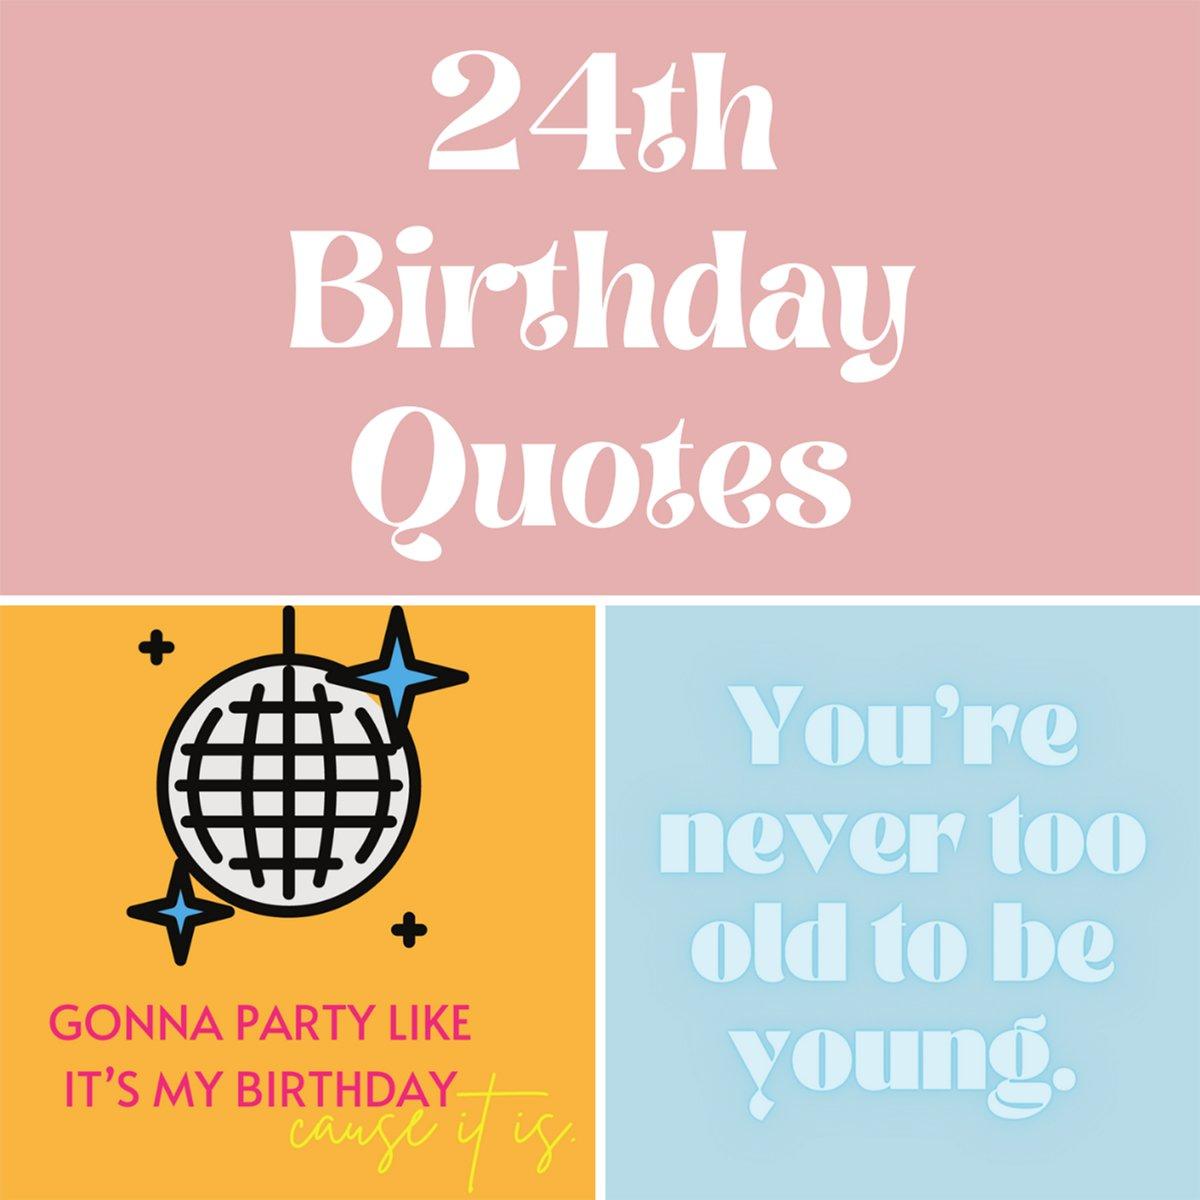 24th Birthday Quotes Captions